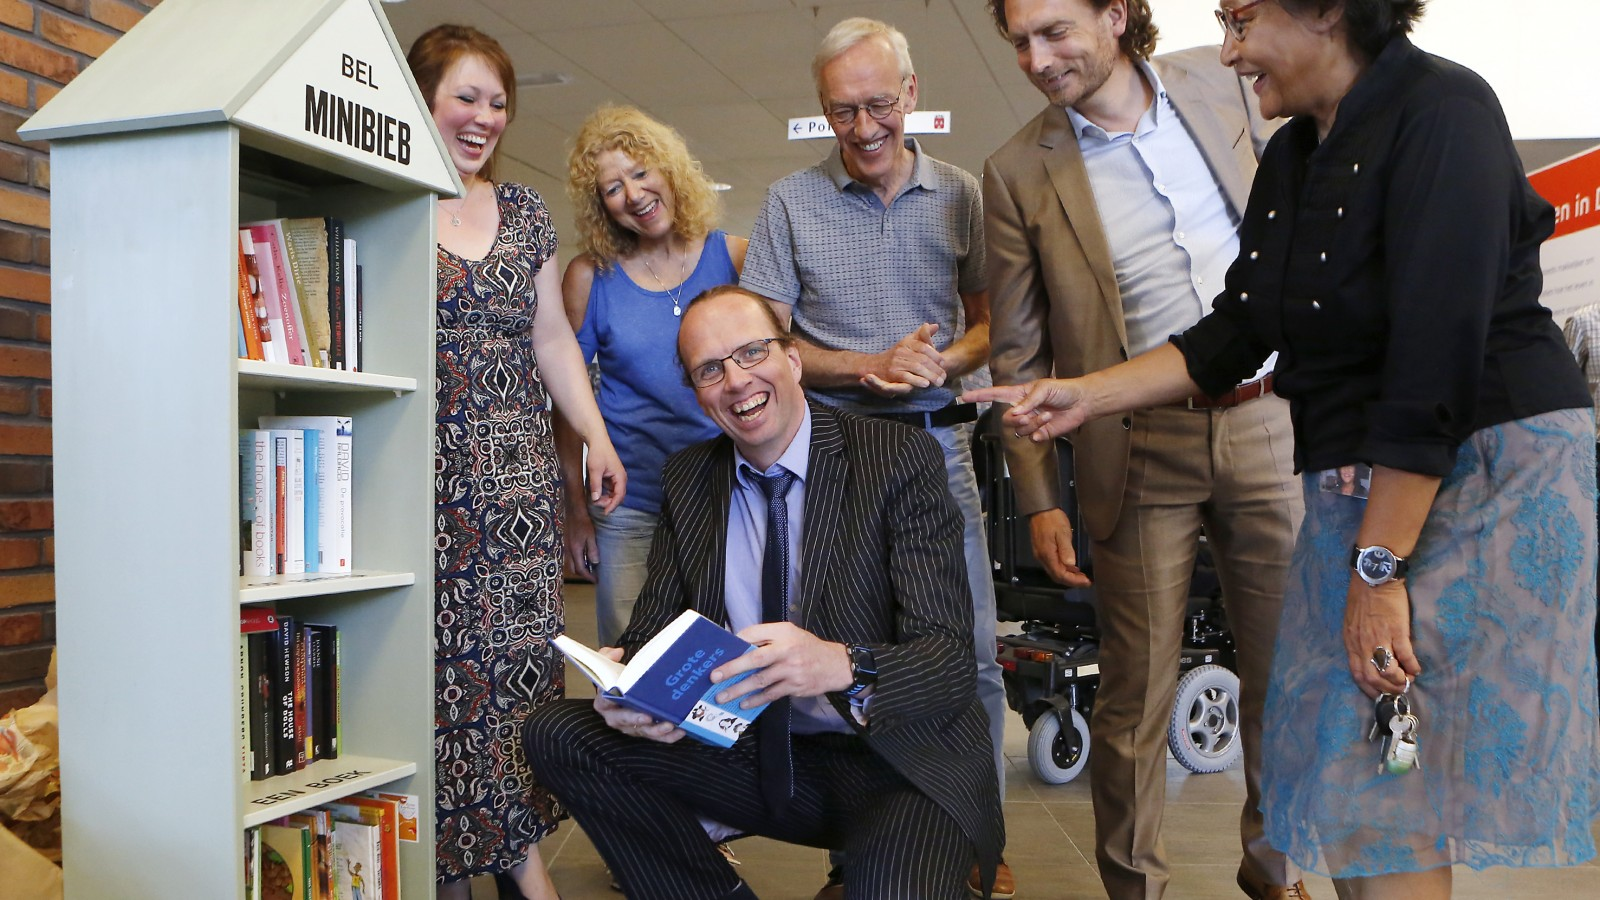 Eemnesser wethouder Sven Lankreijer (PvdA) stapt op